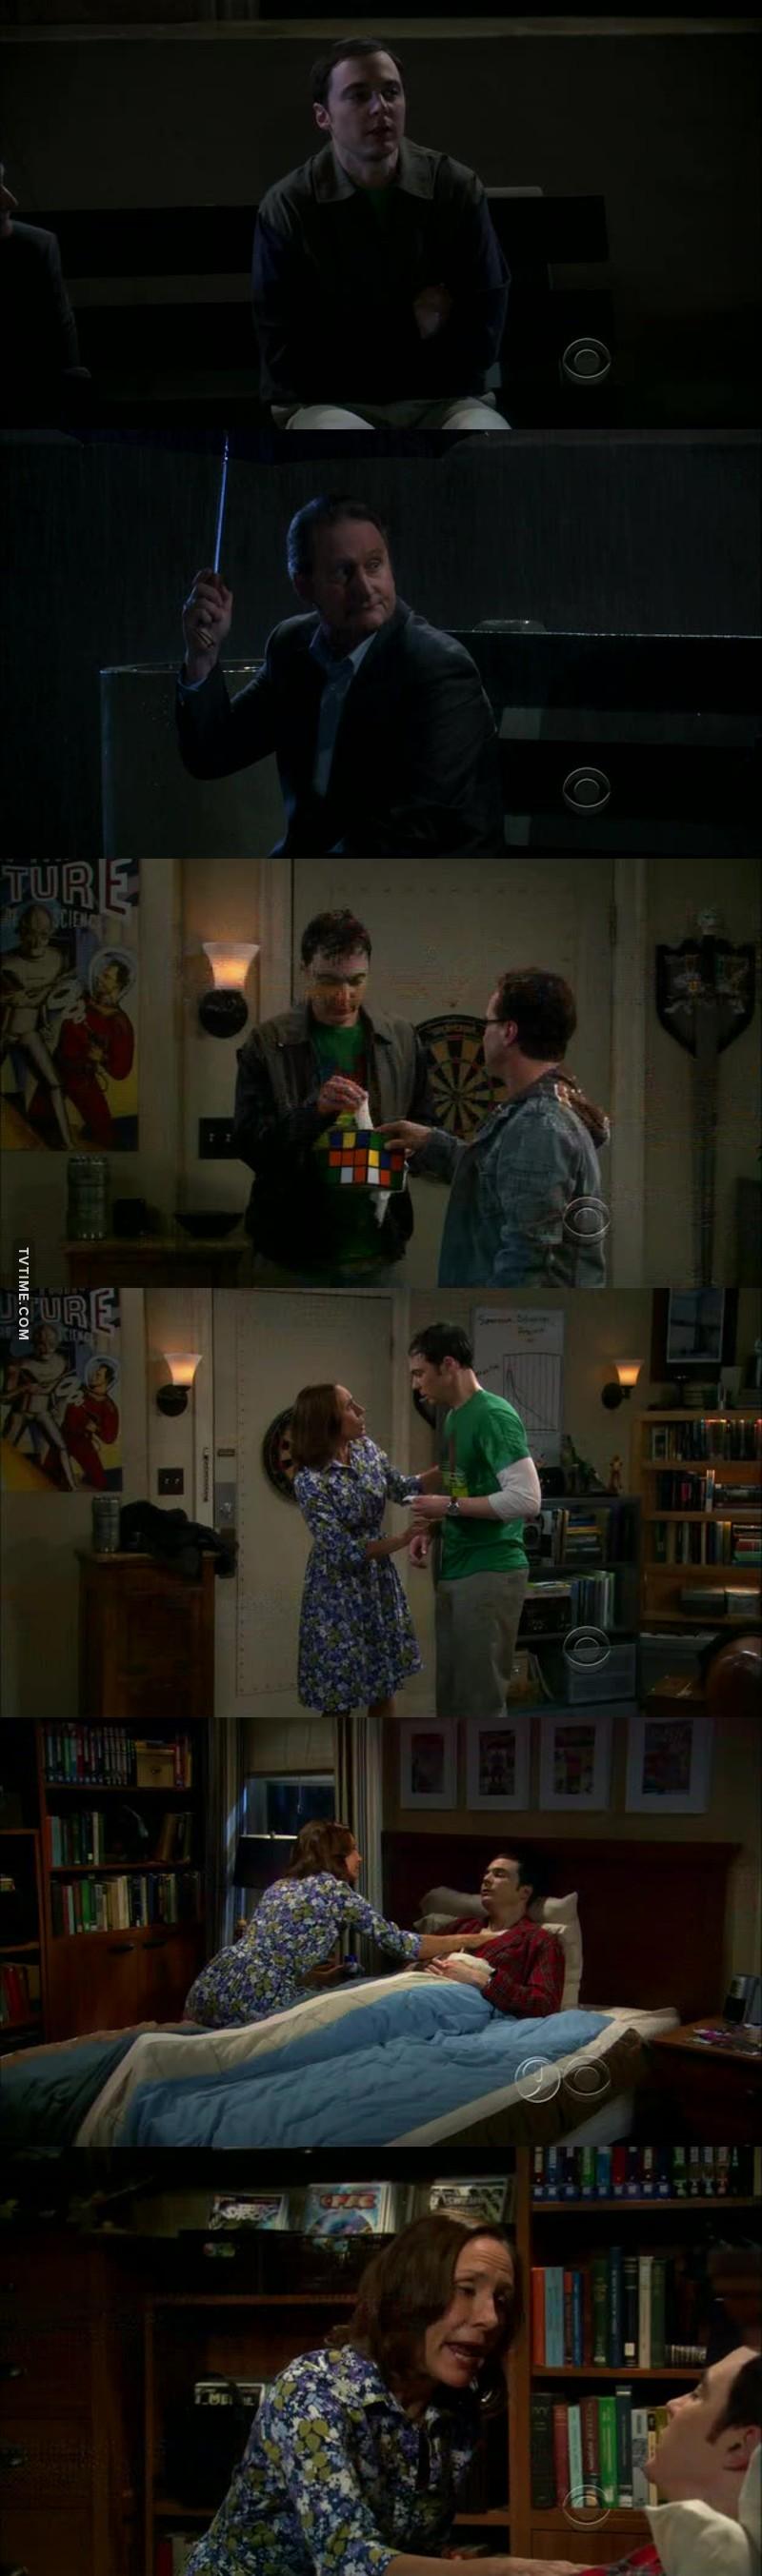 Sheldon! 😂😂😂😂